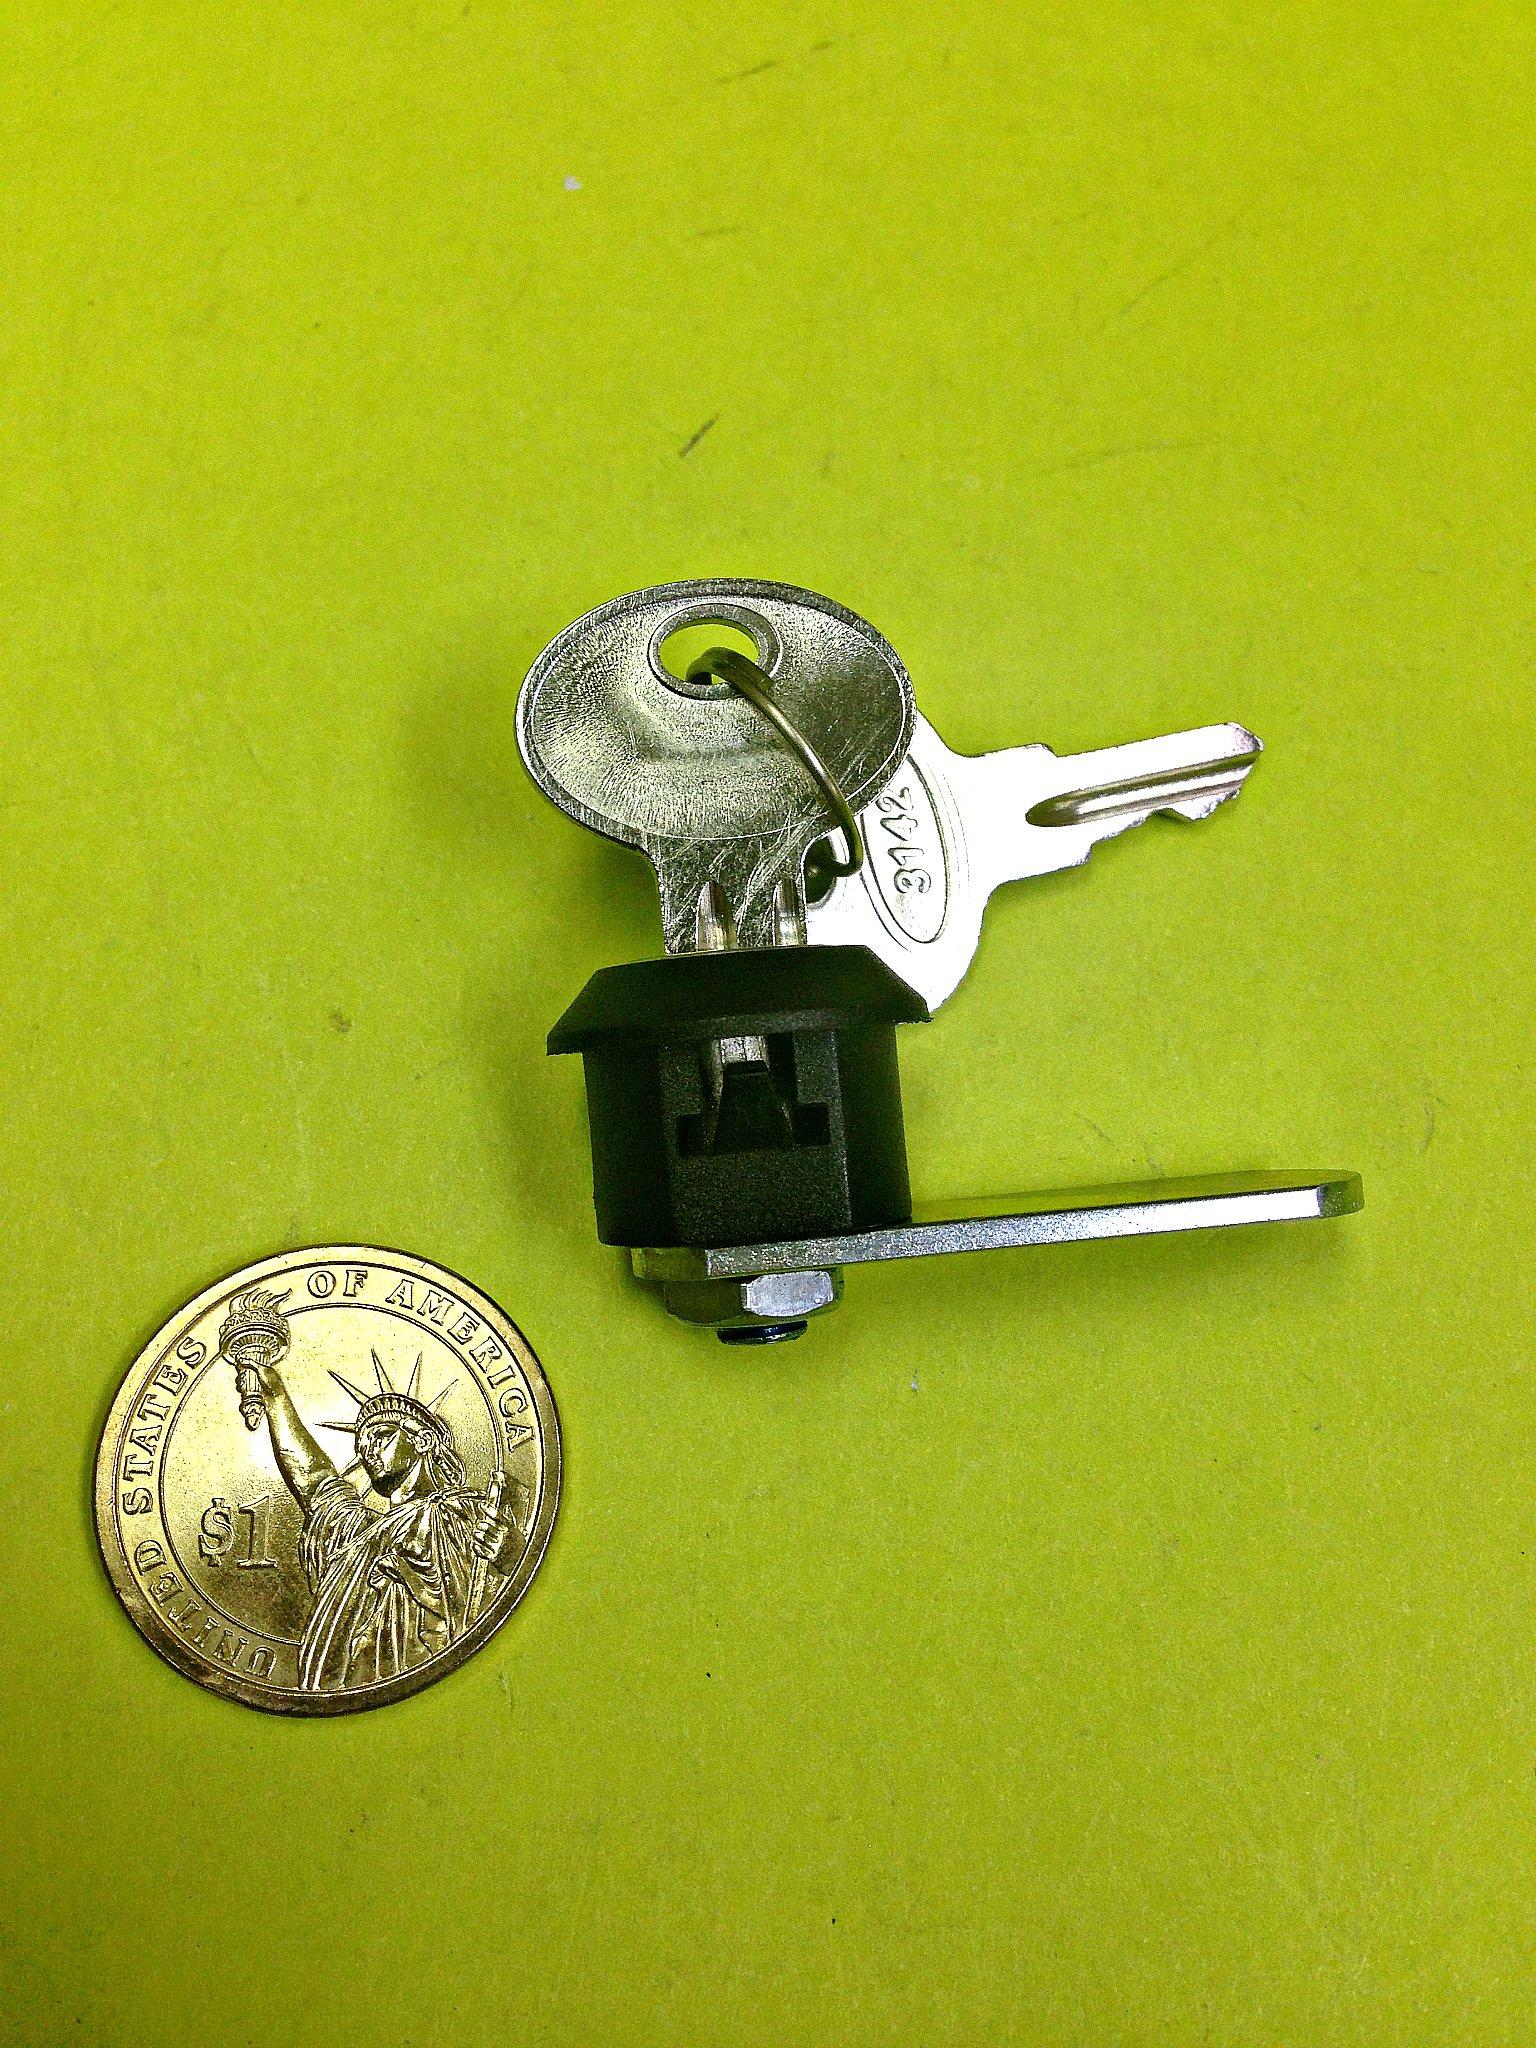 BOX OF 10, 45° Cam Lock Spring Cabinet Mailbox Desk Drawer Cupboard Locker 2 Keys